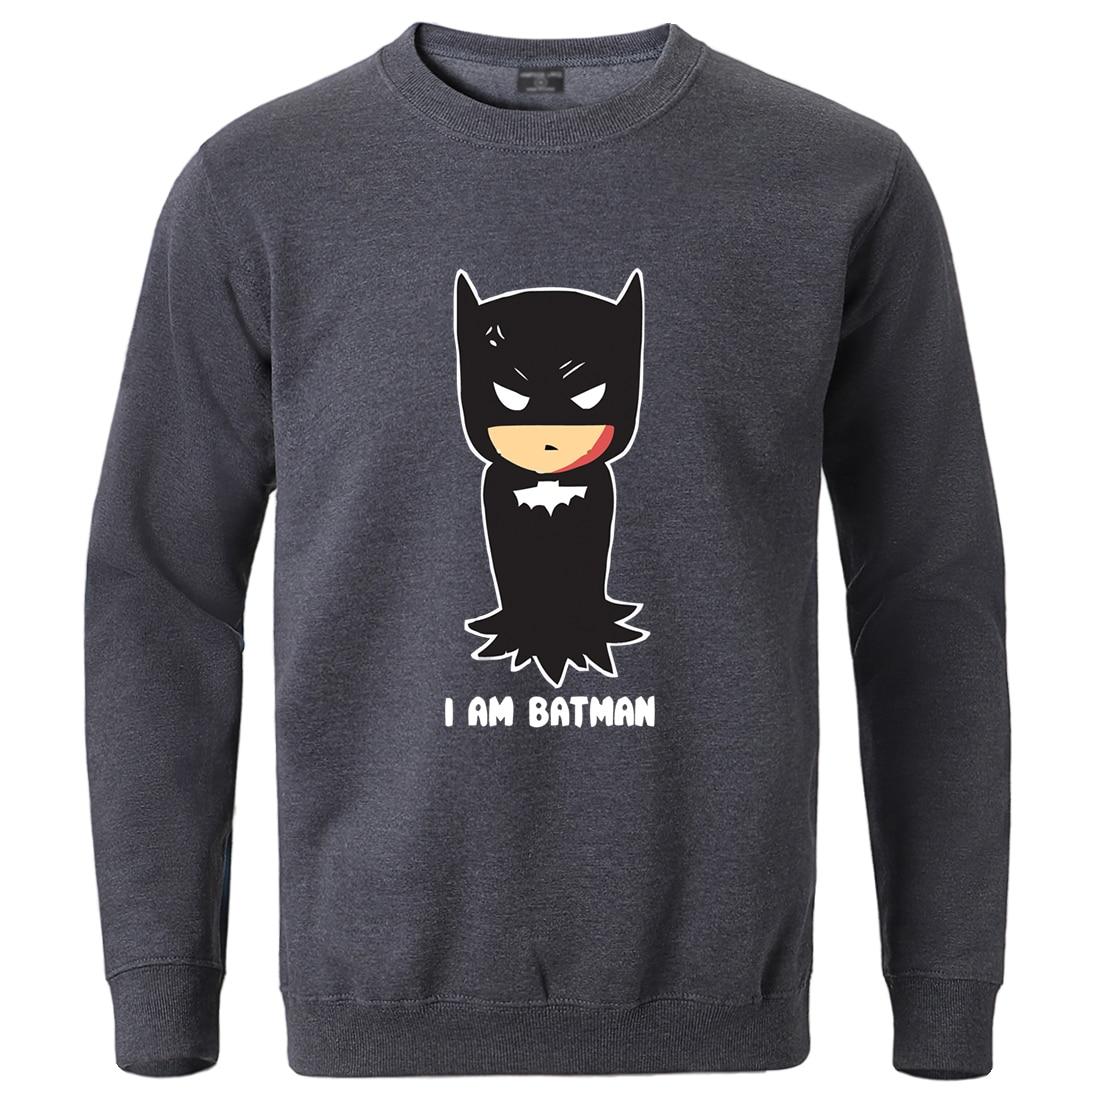 Superman I'm Batman Print Sweatshirts Male Winter Casual Tracksuit Fleece Warm Crewneck Pullover Hip Hop Loose Casual Sportswear